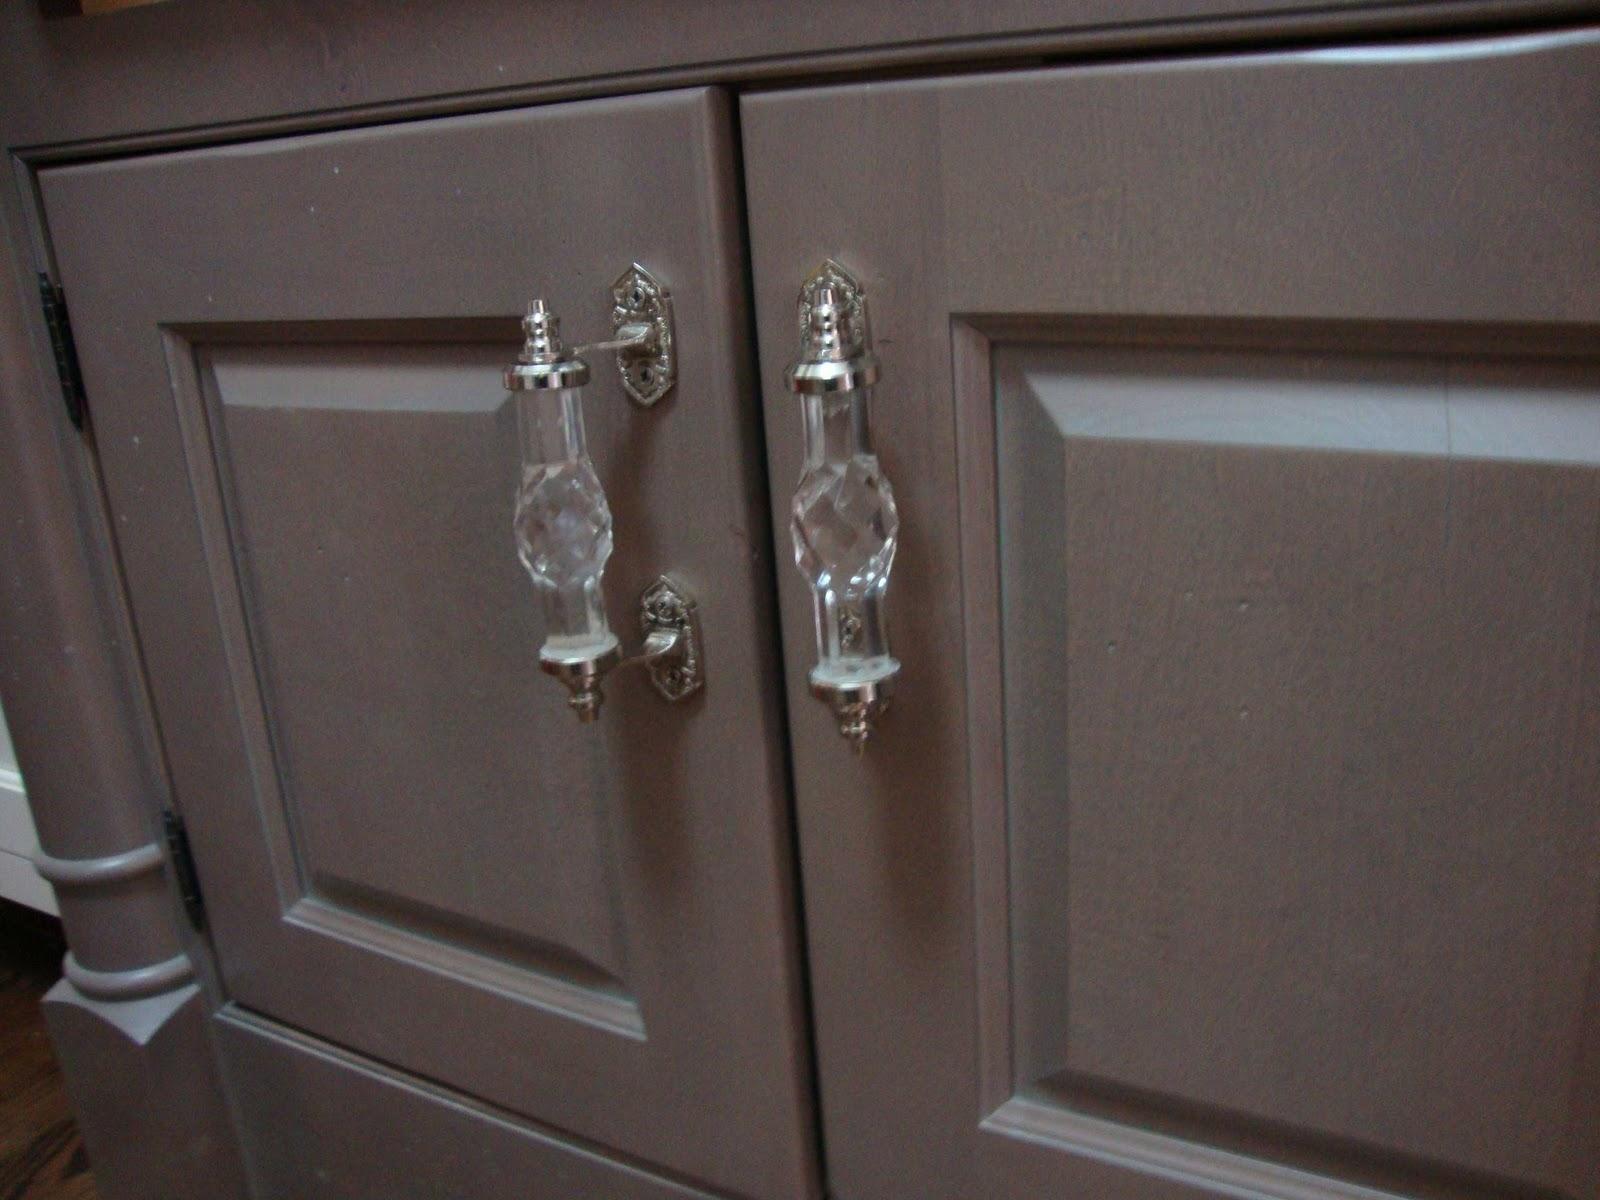 Door Stops, Holders,Restraints, Chain Bolts and Foot Bolts - Door